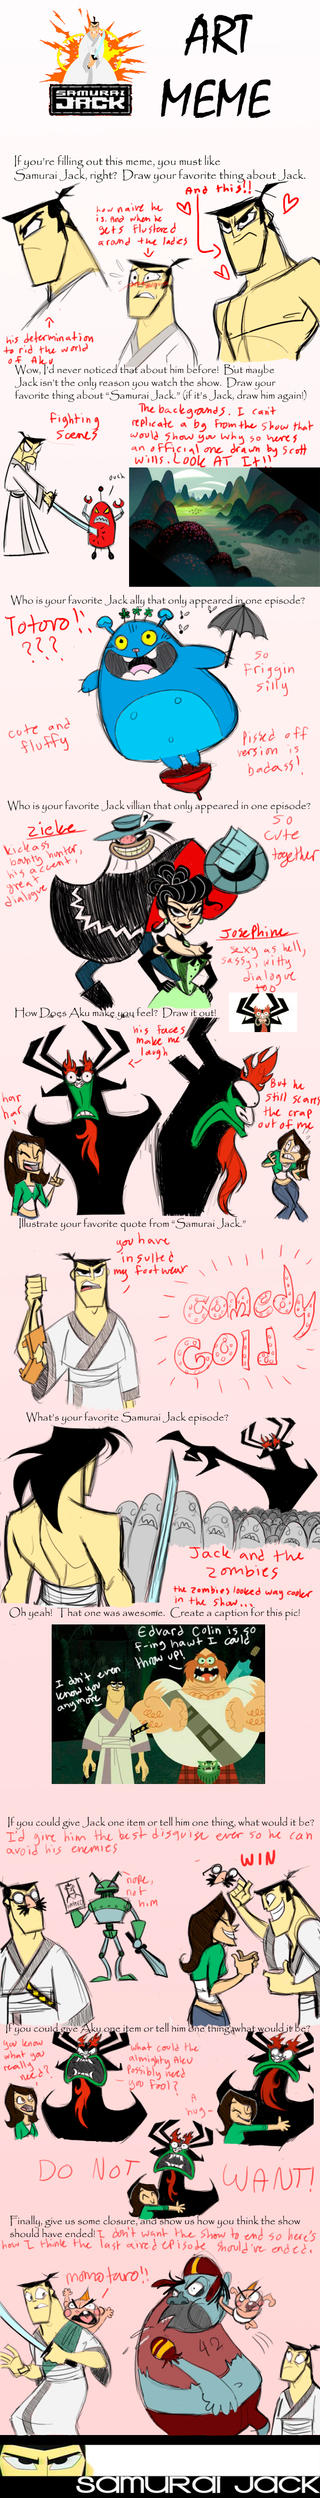 samurai jack meme by Kikoli on DeviantArt